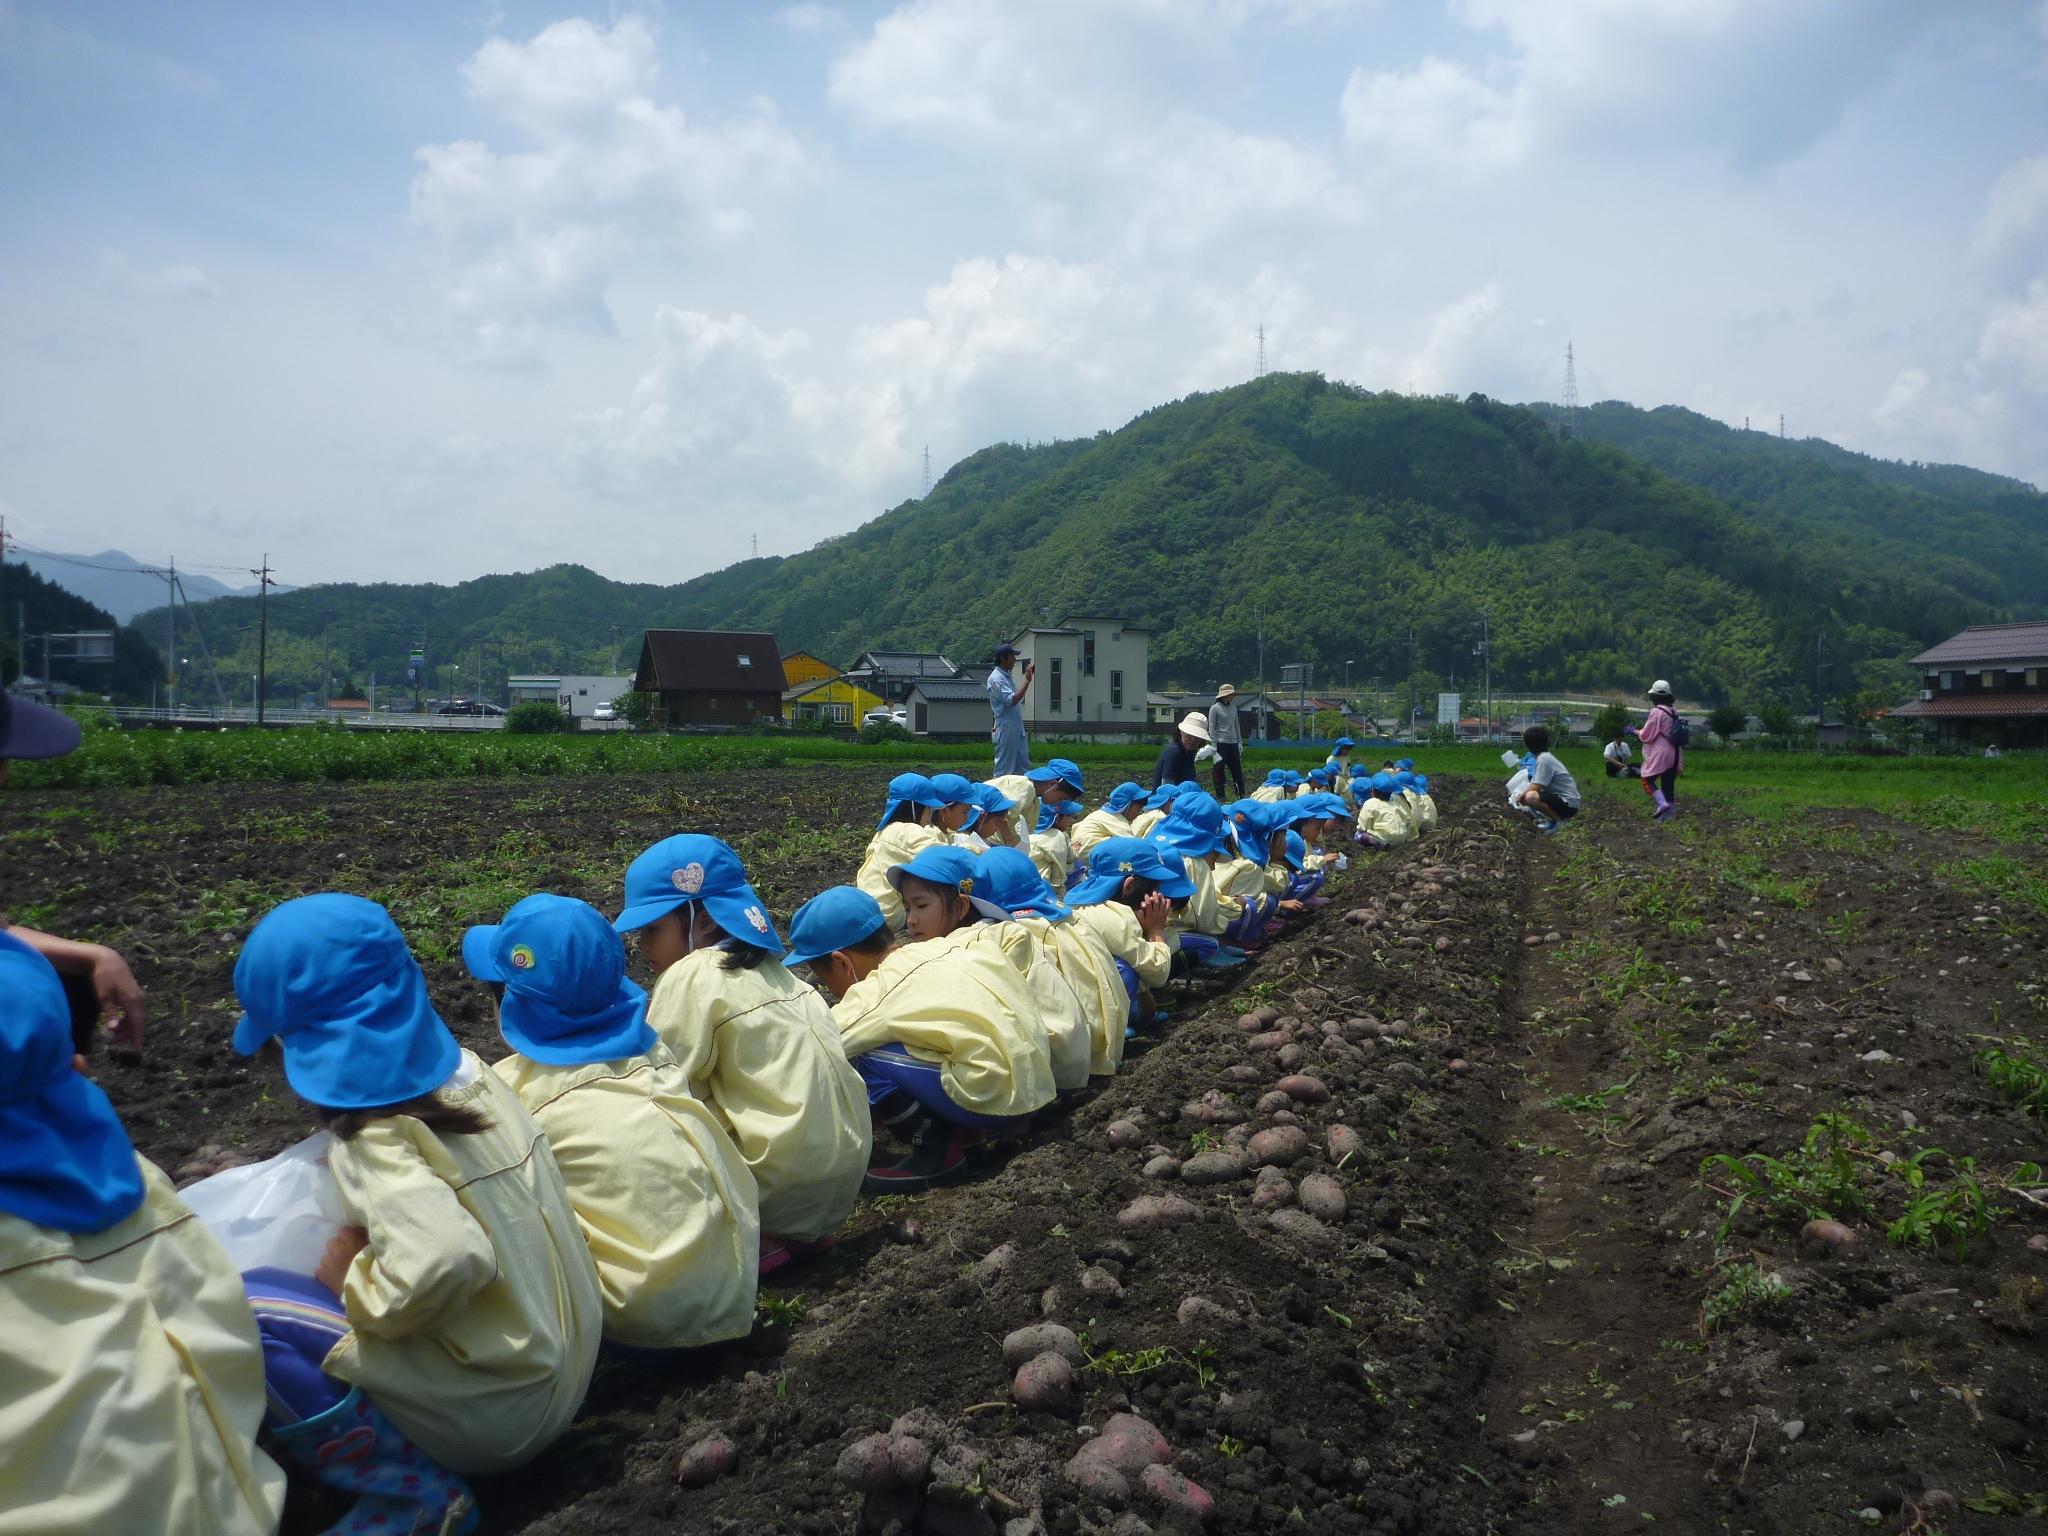 http://www.inaba-kankyo.co.jp/news/photo/P1050636.JPG